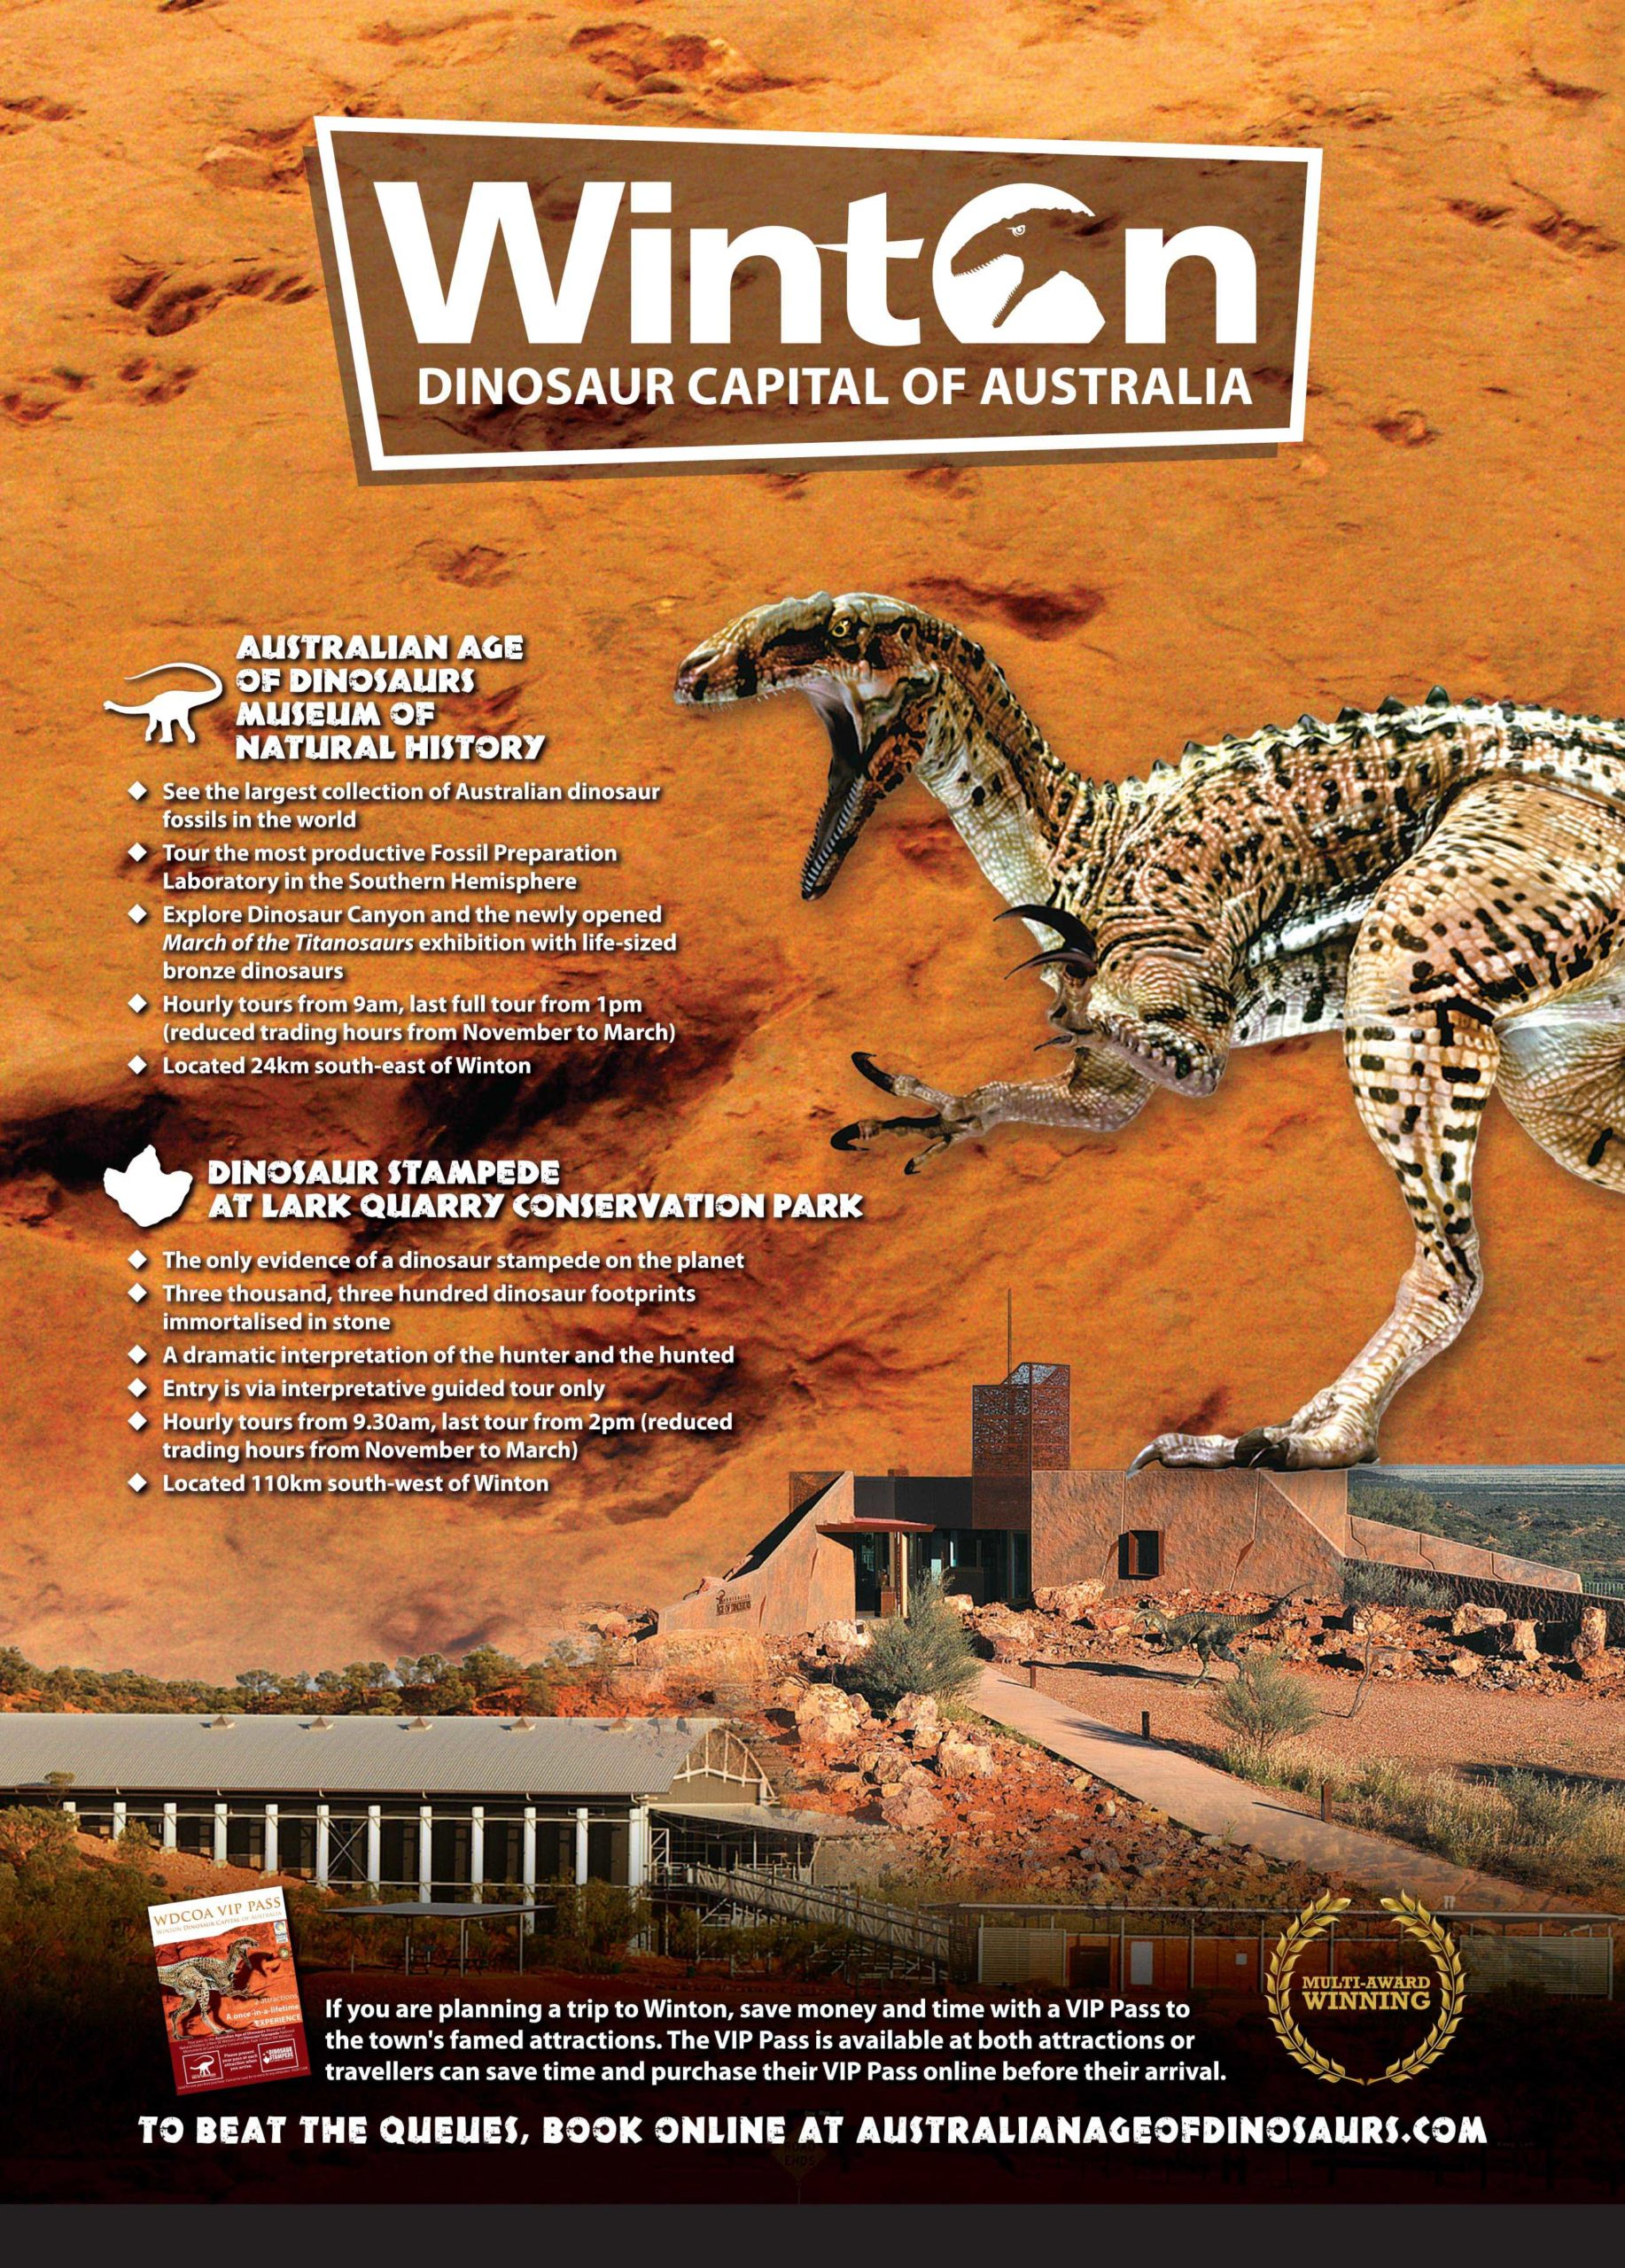 Winton Dinosaur Capital of Australia